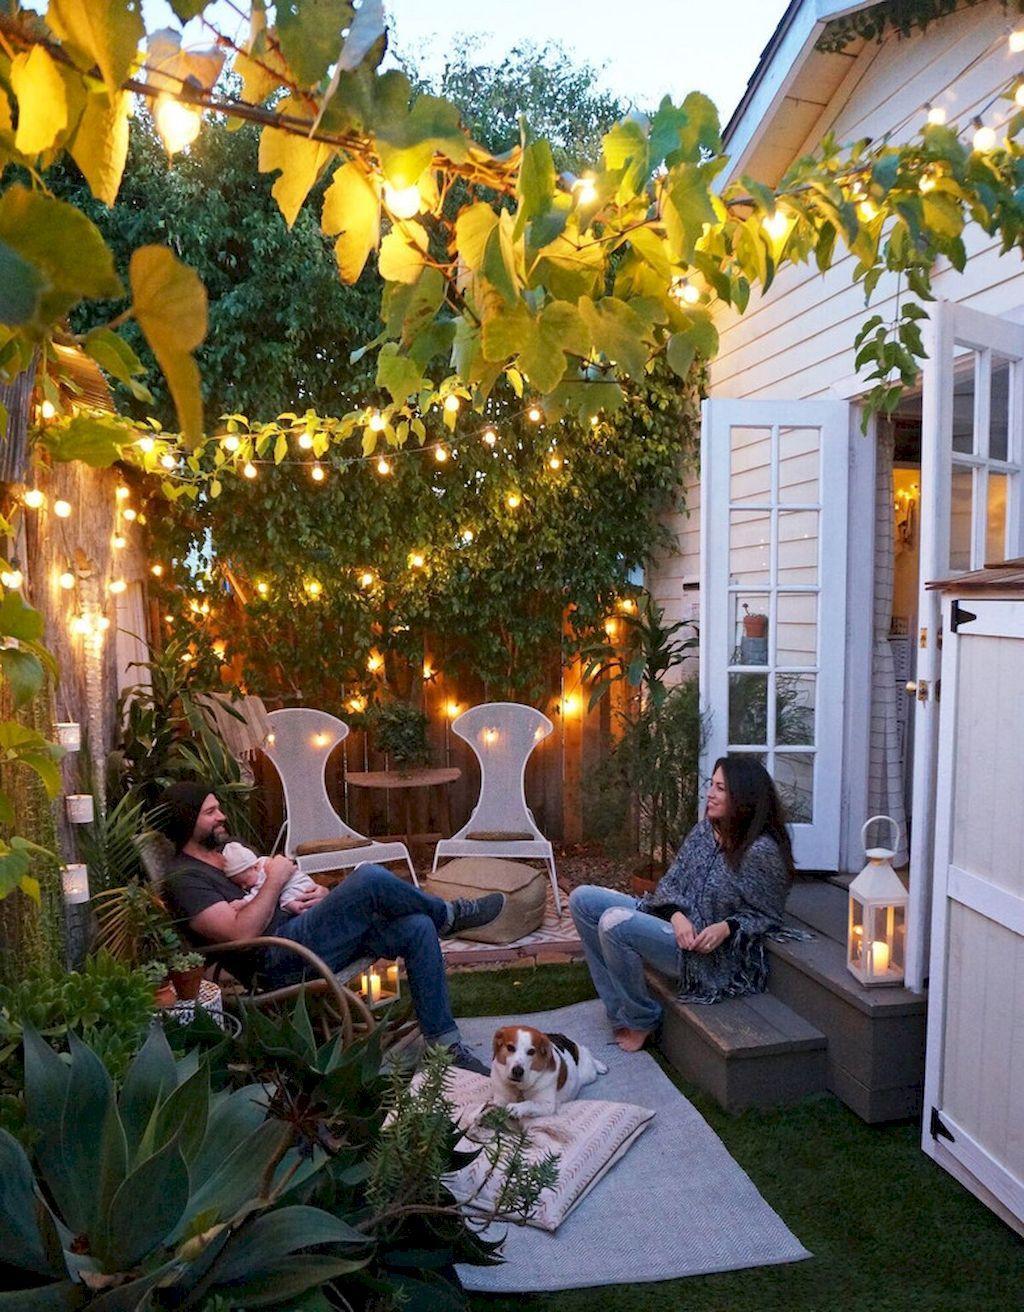 60 Low Maintenance Small Backyard Garden Ideas | Backyard garden ...